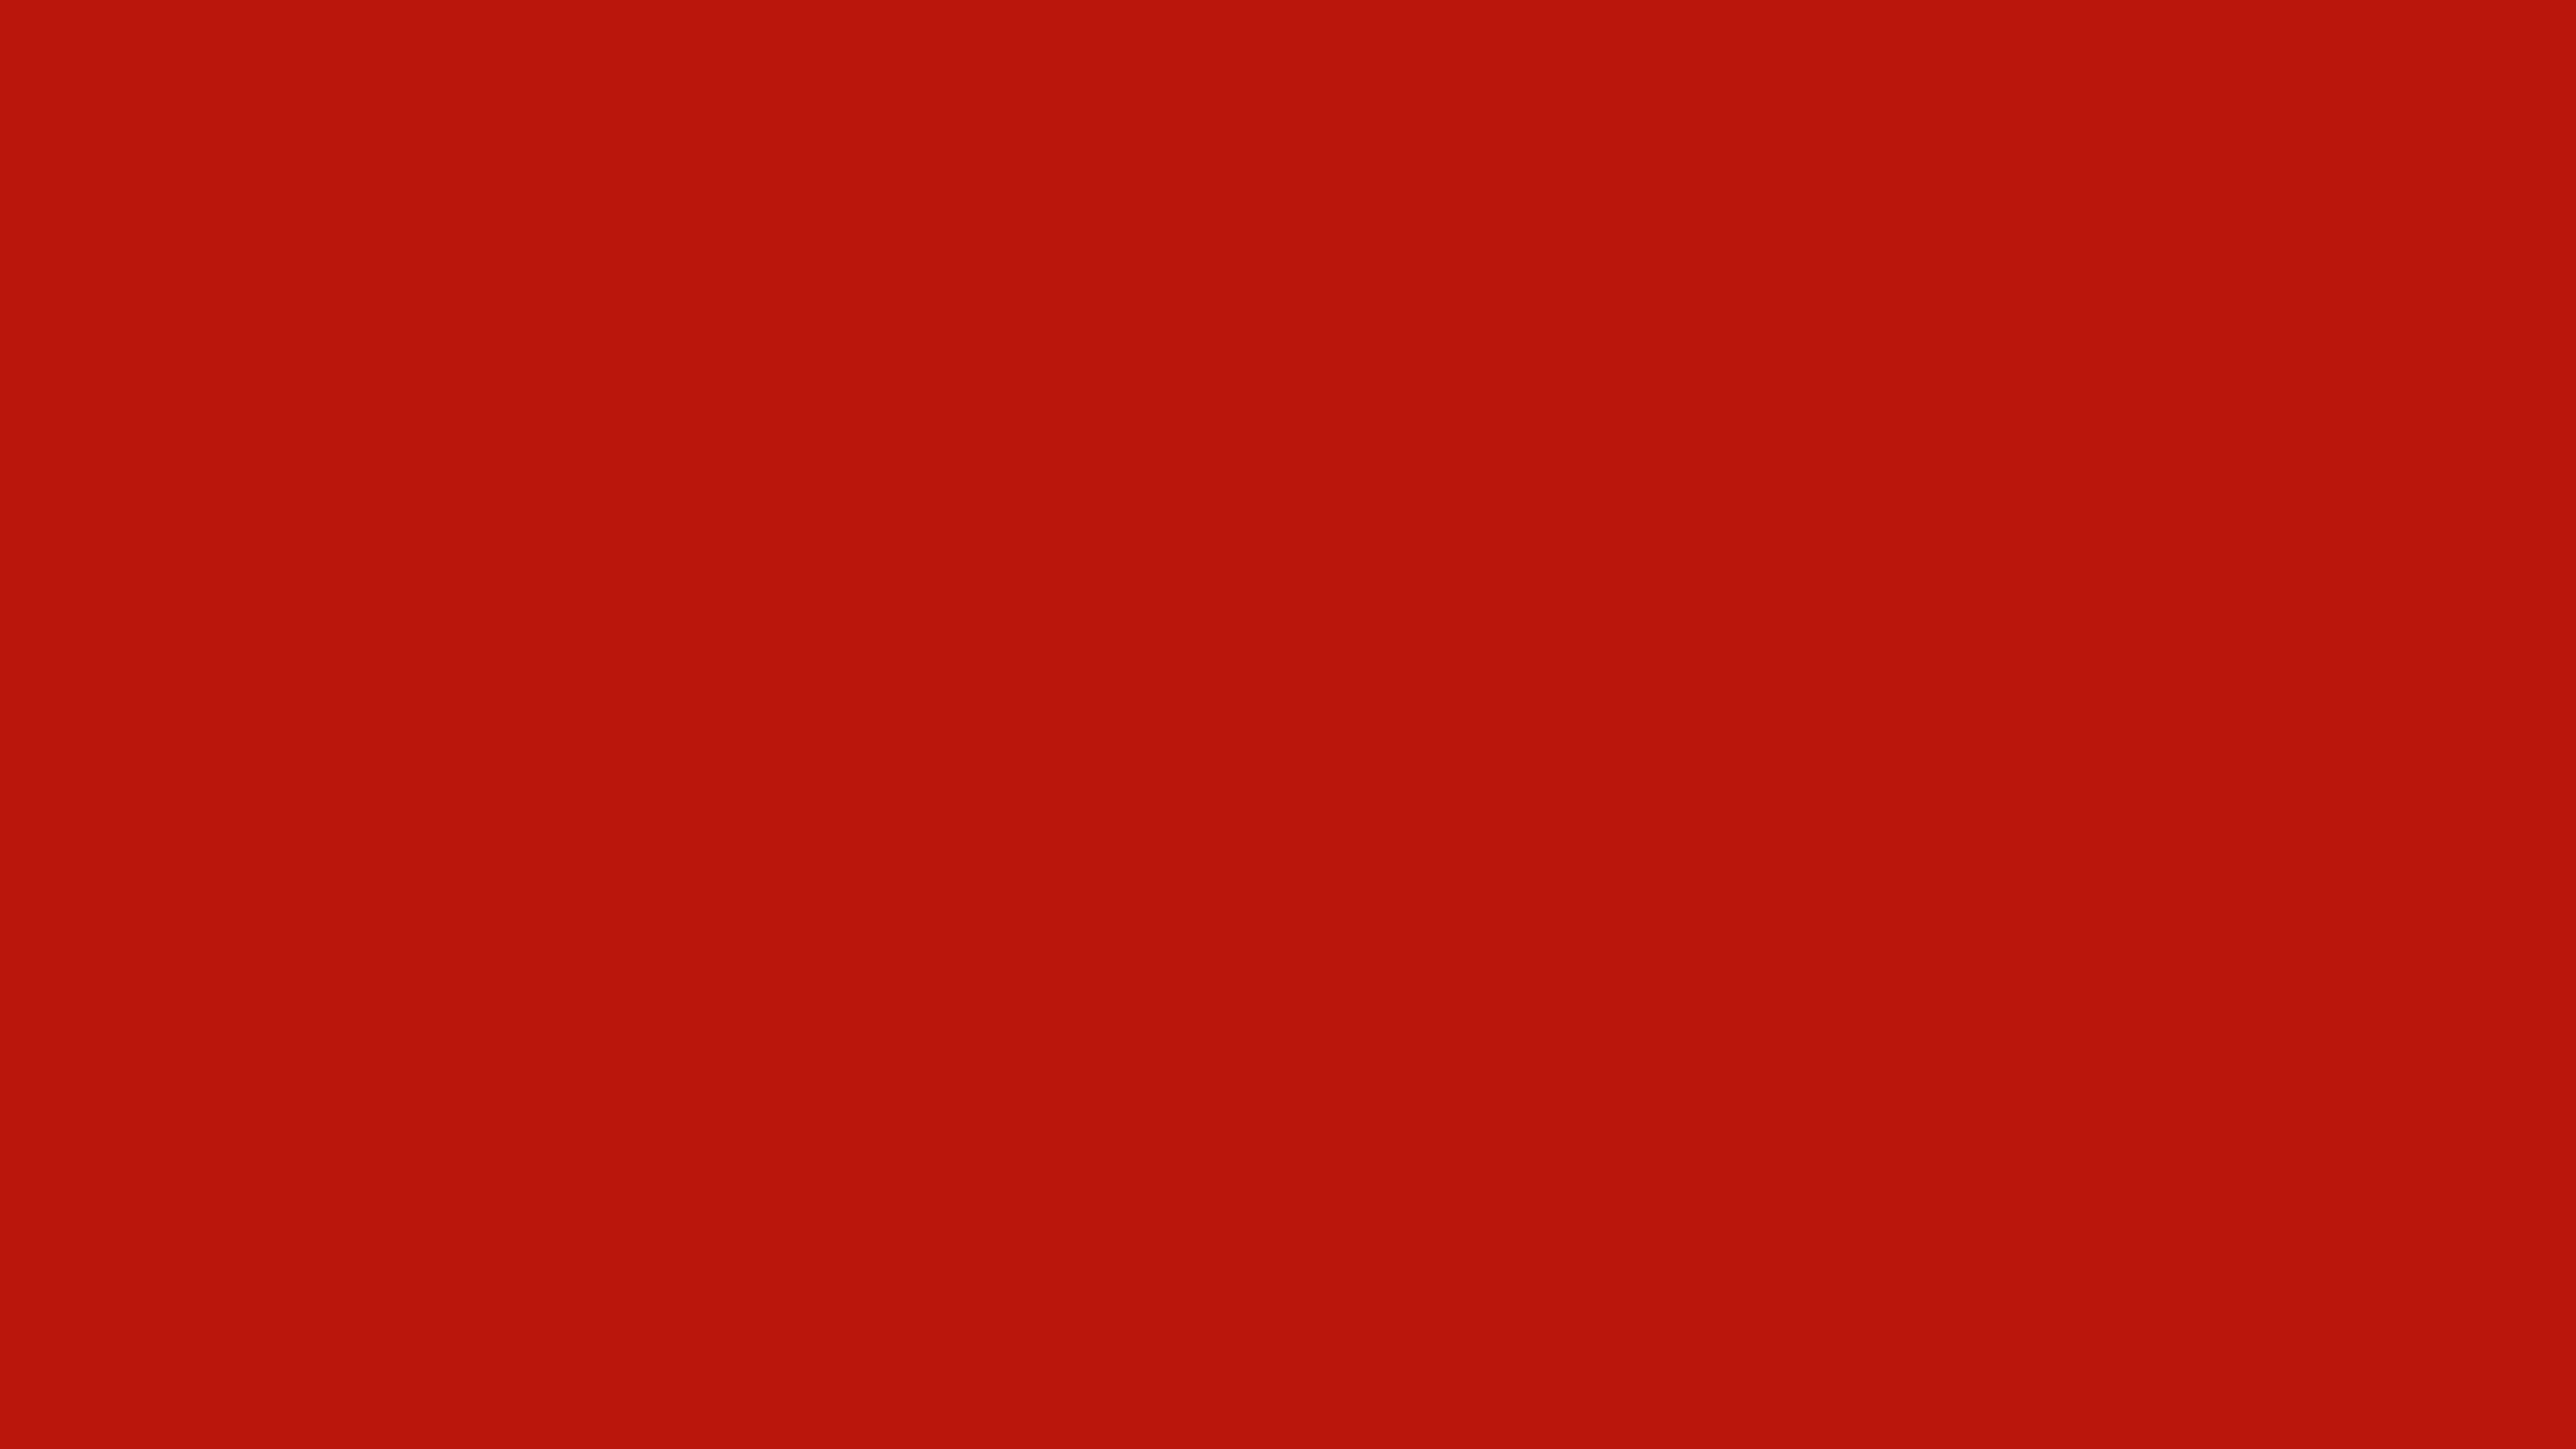 3840x2160 International Orange Engineering Solid Color Background